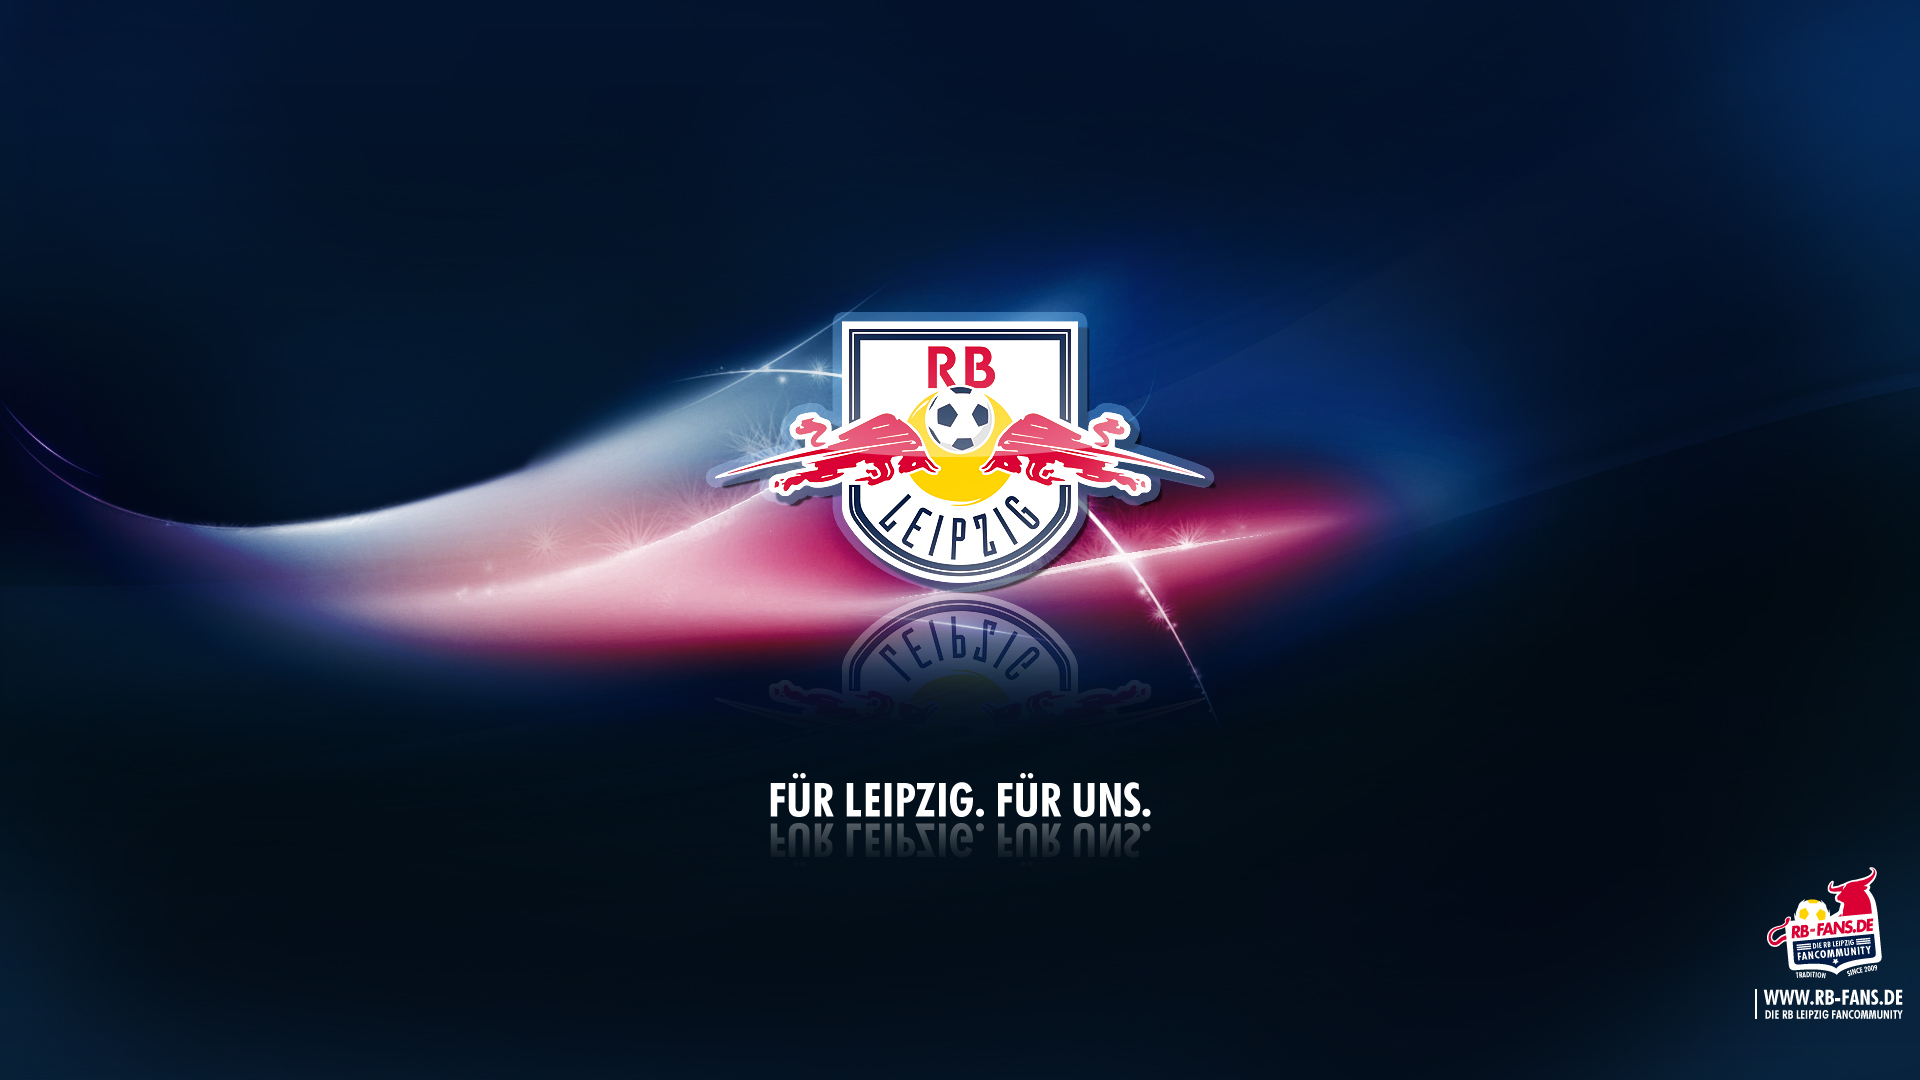 Rb Fans De Die Rb Leipzig Fancommunity